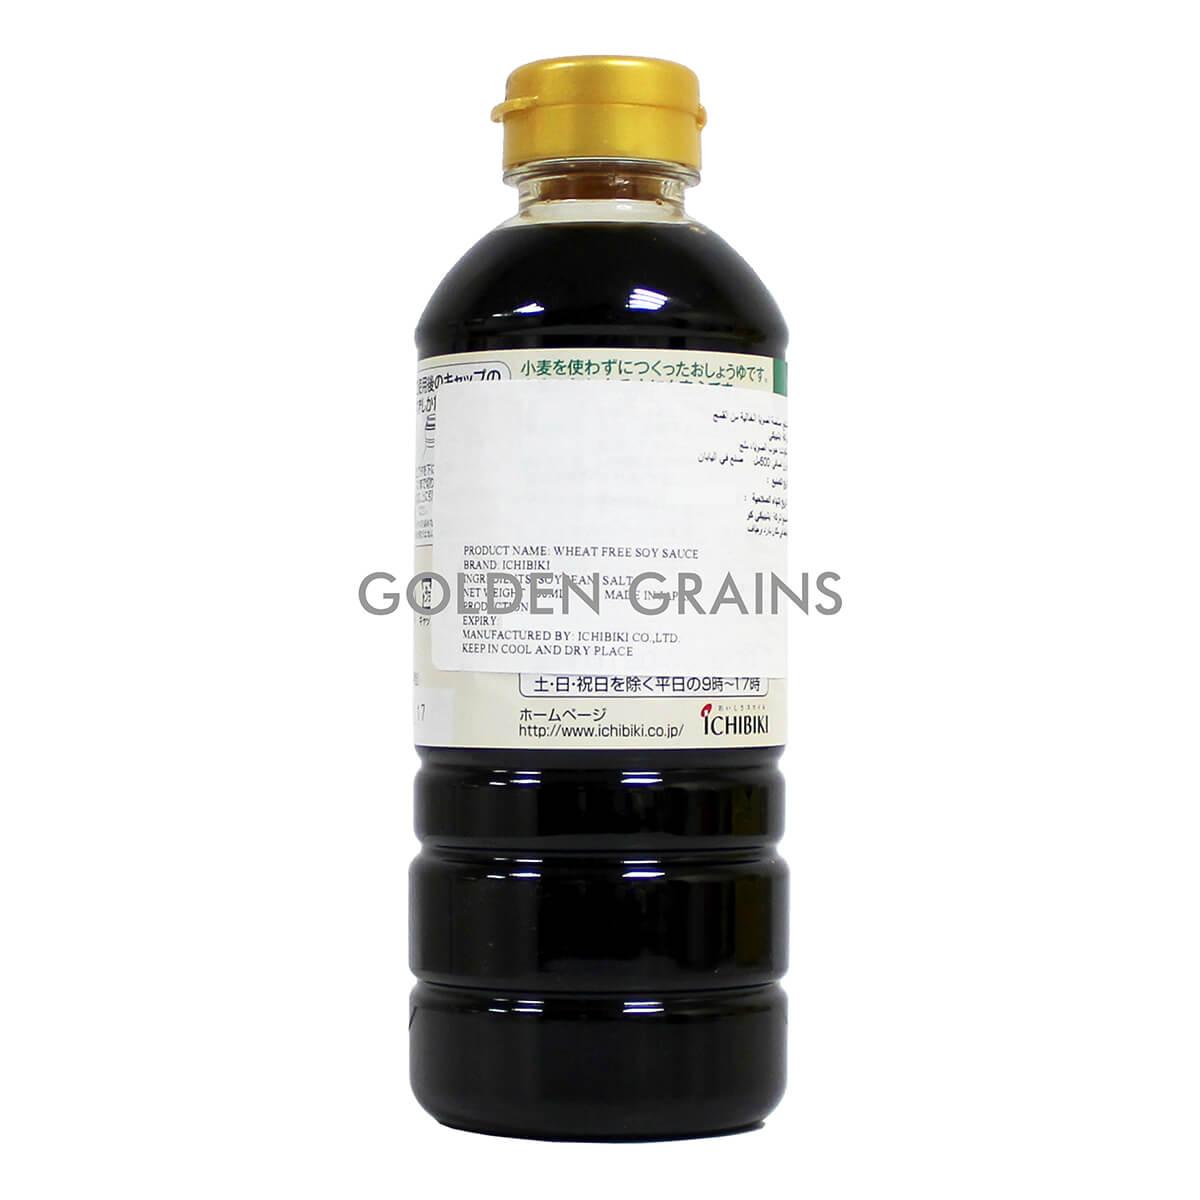 Golden Grains Dubai Export - Ichibiki Soy Sauce - Back.jpg